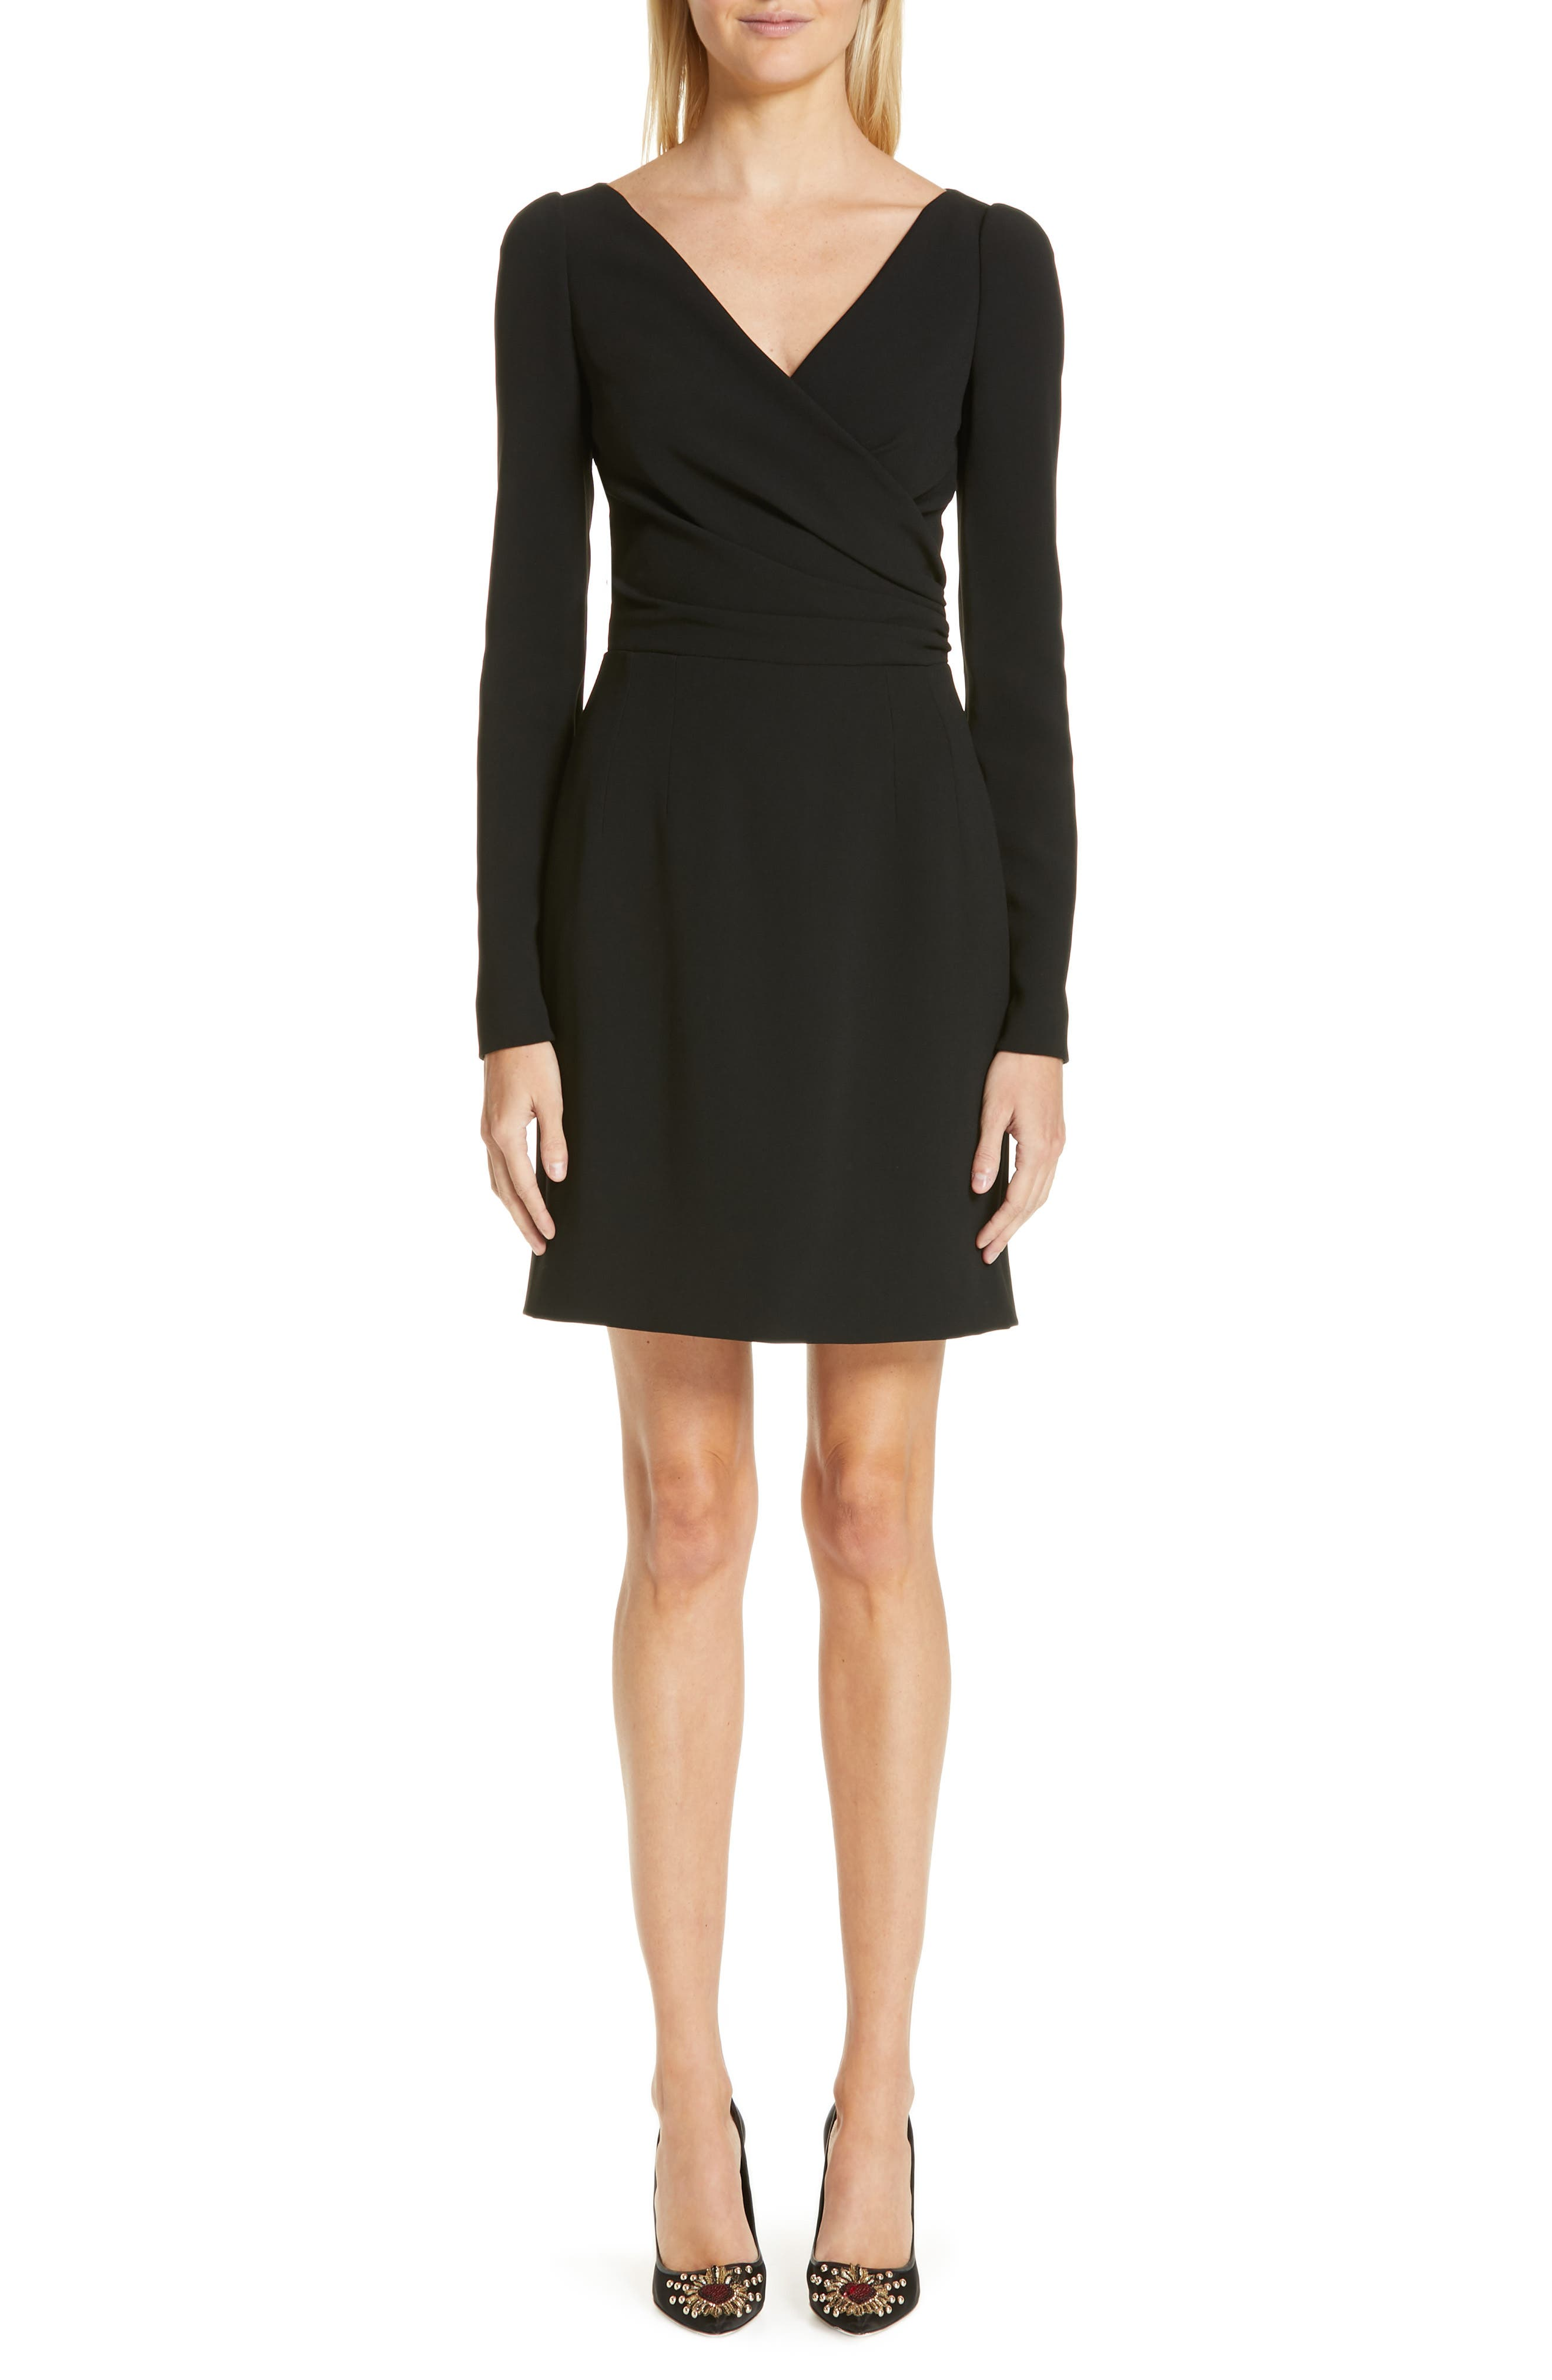 Dolce & gabbana Surplice Dress, 8 IT - Black